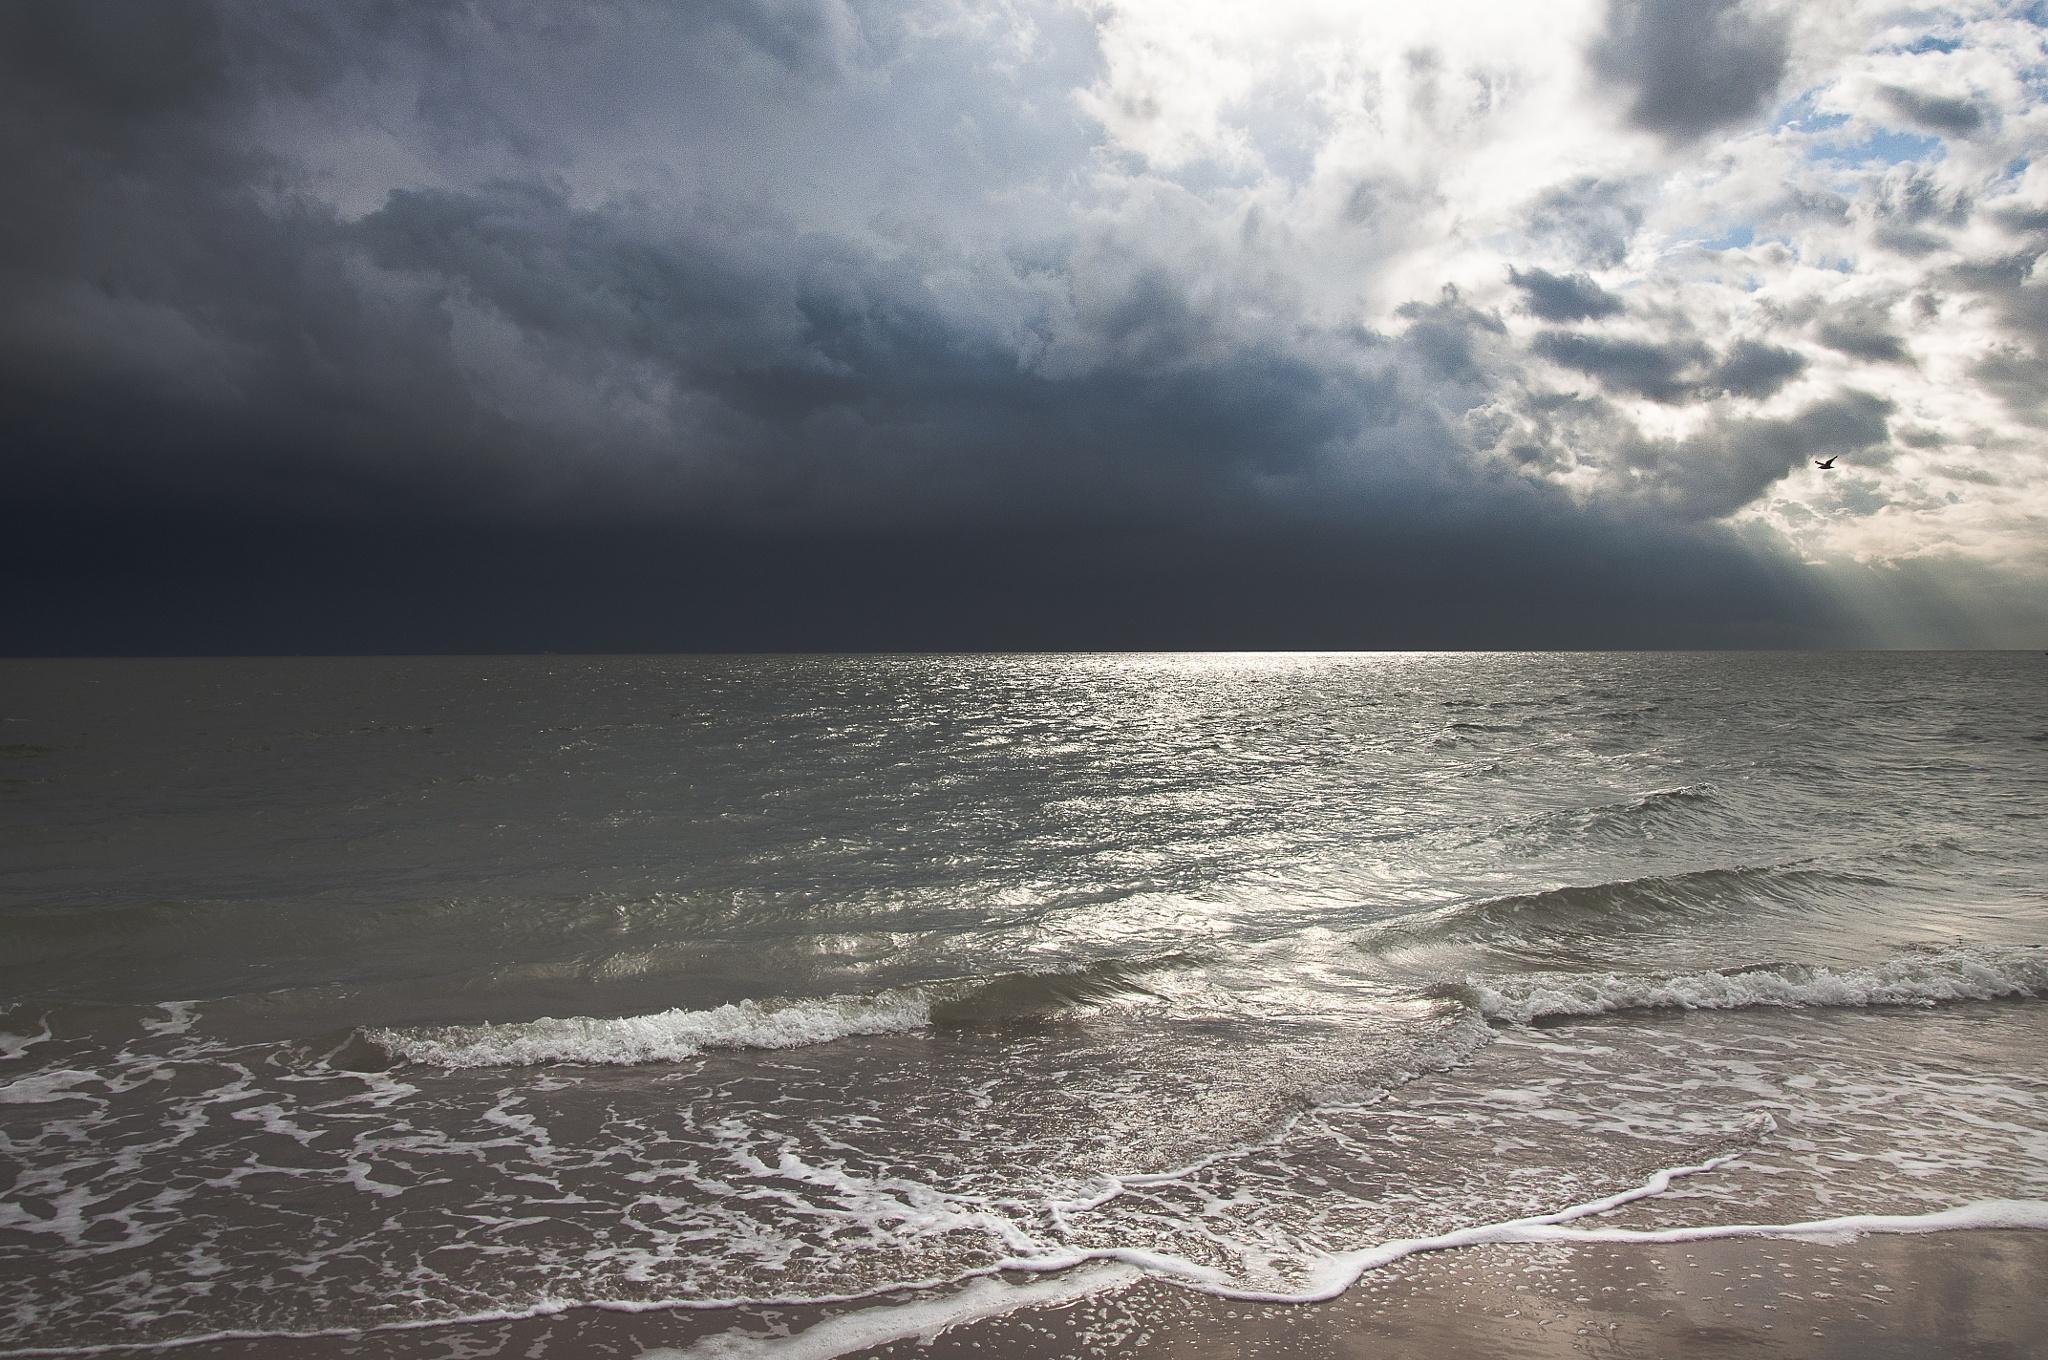 November Storm by Sonja Pixels